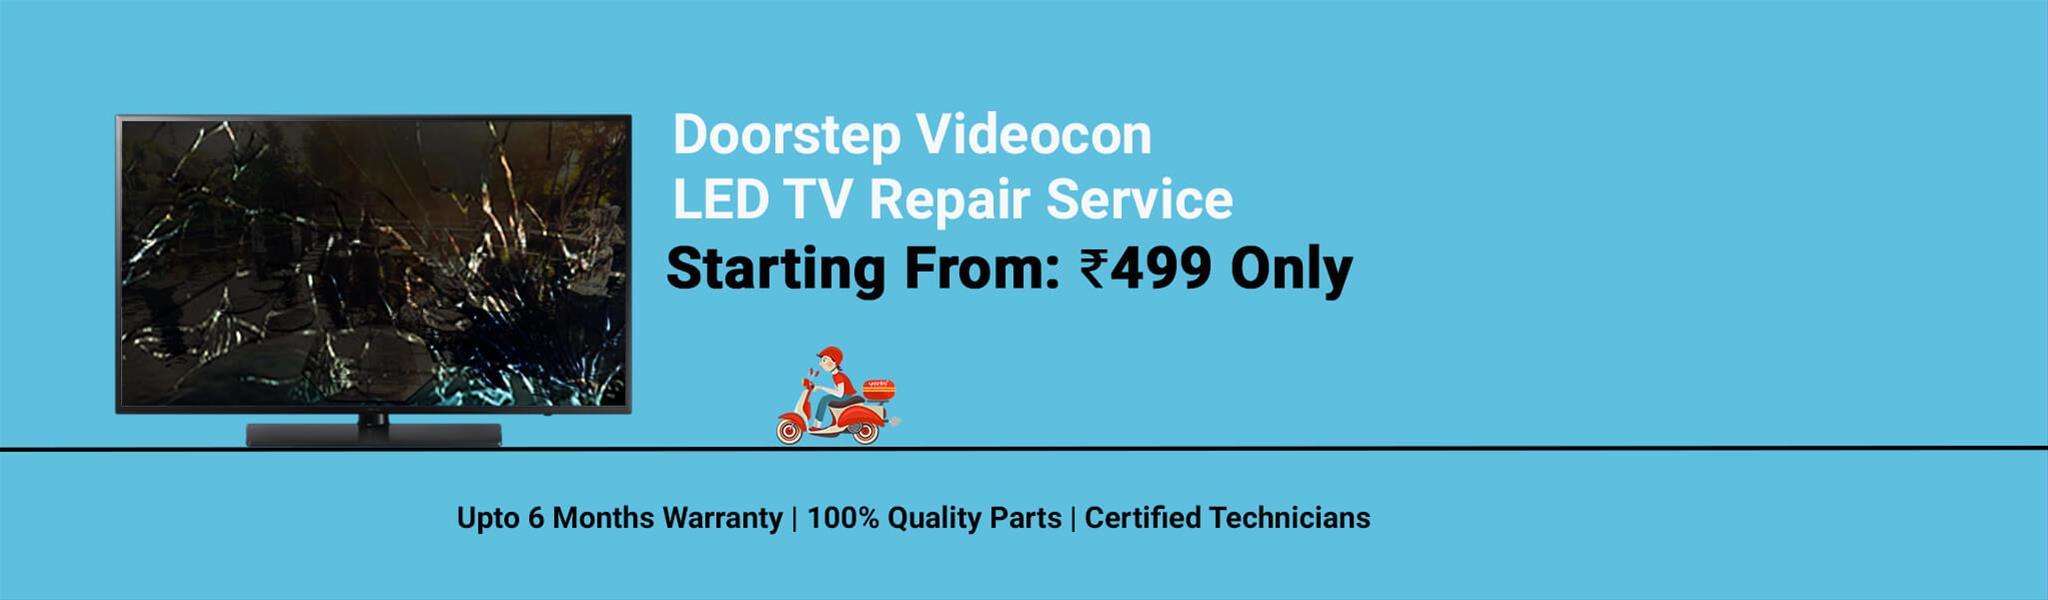 videocon-led-tv-repair.jpg